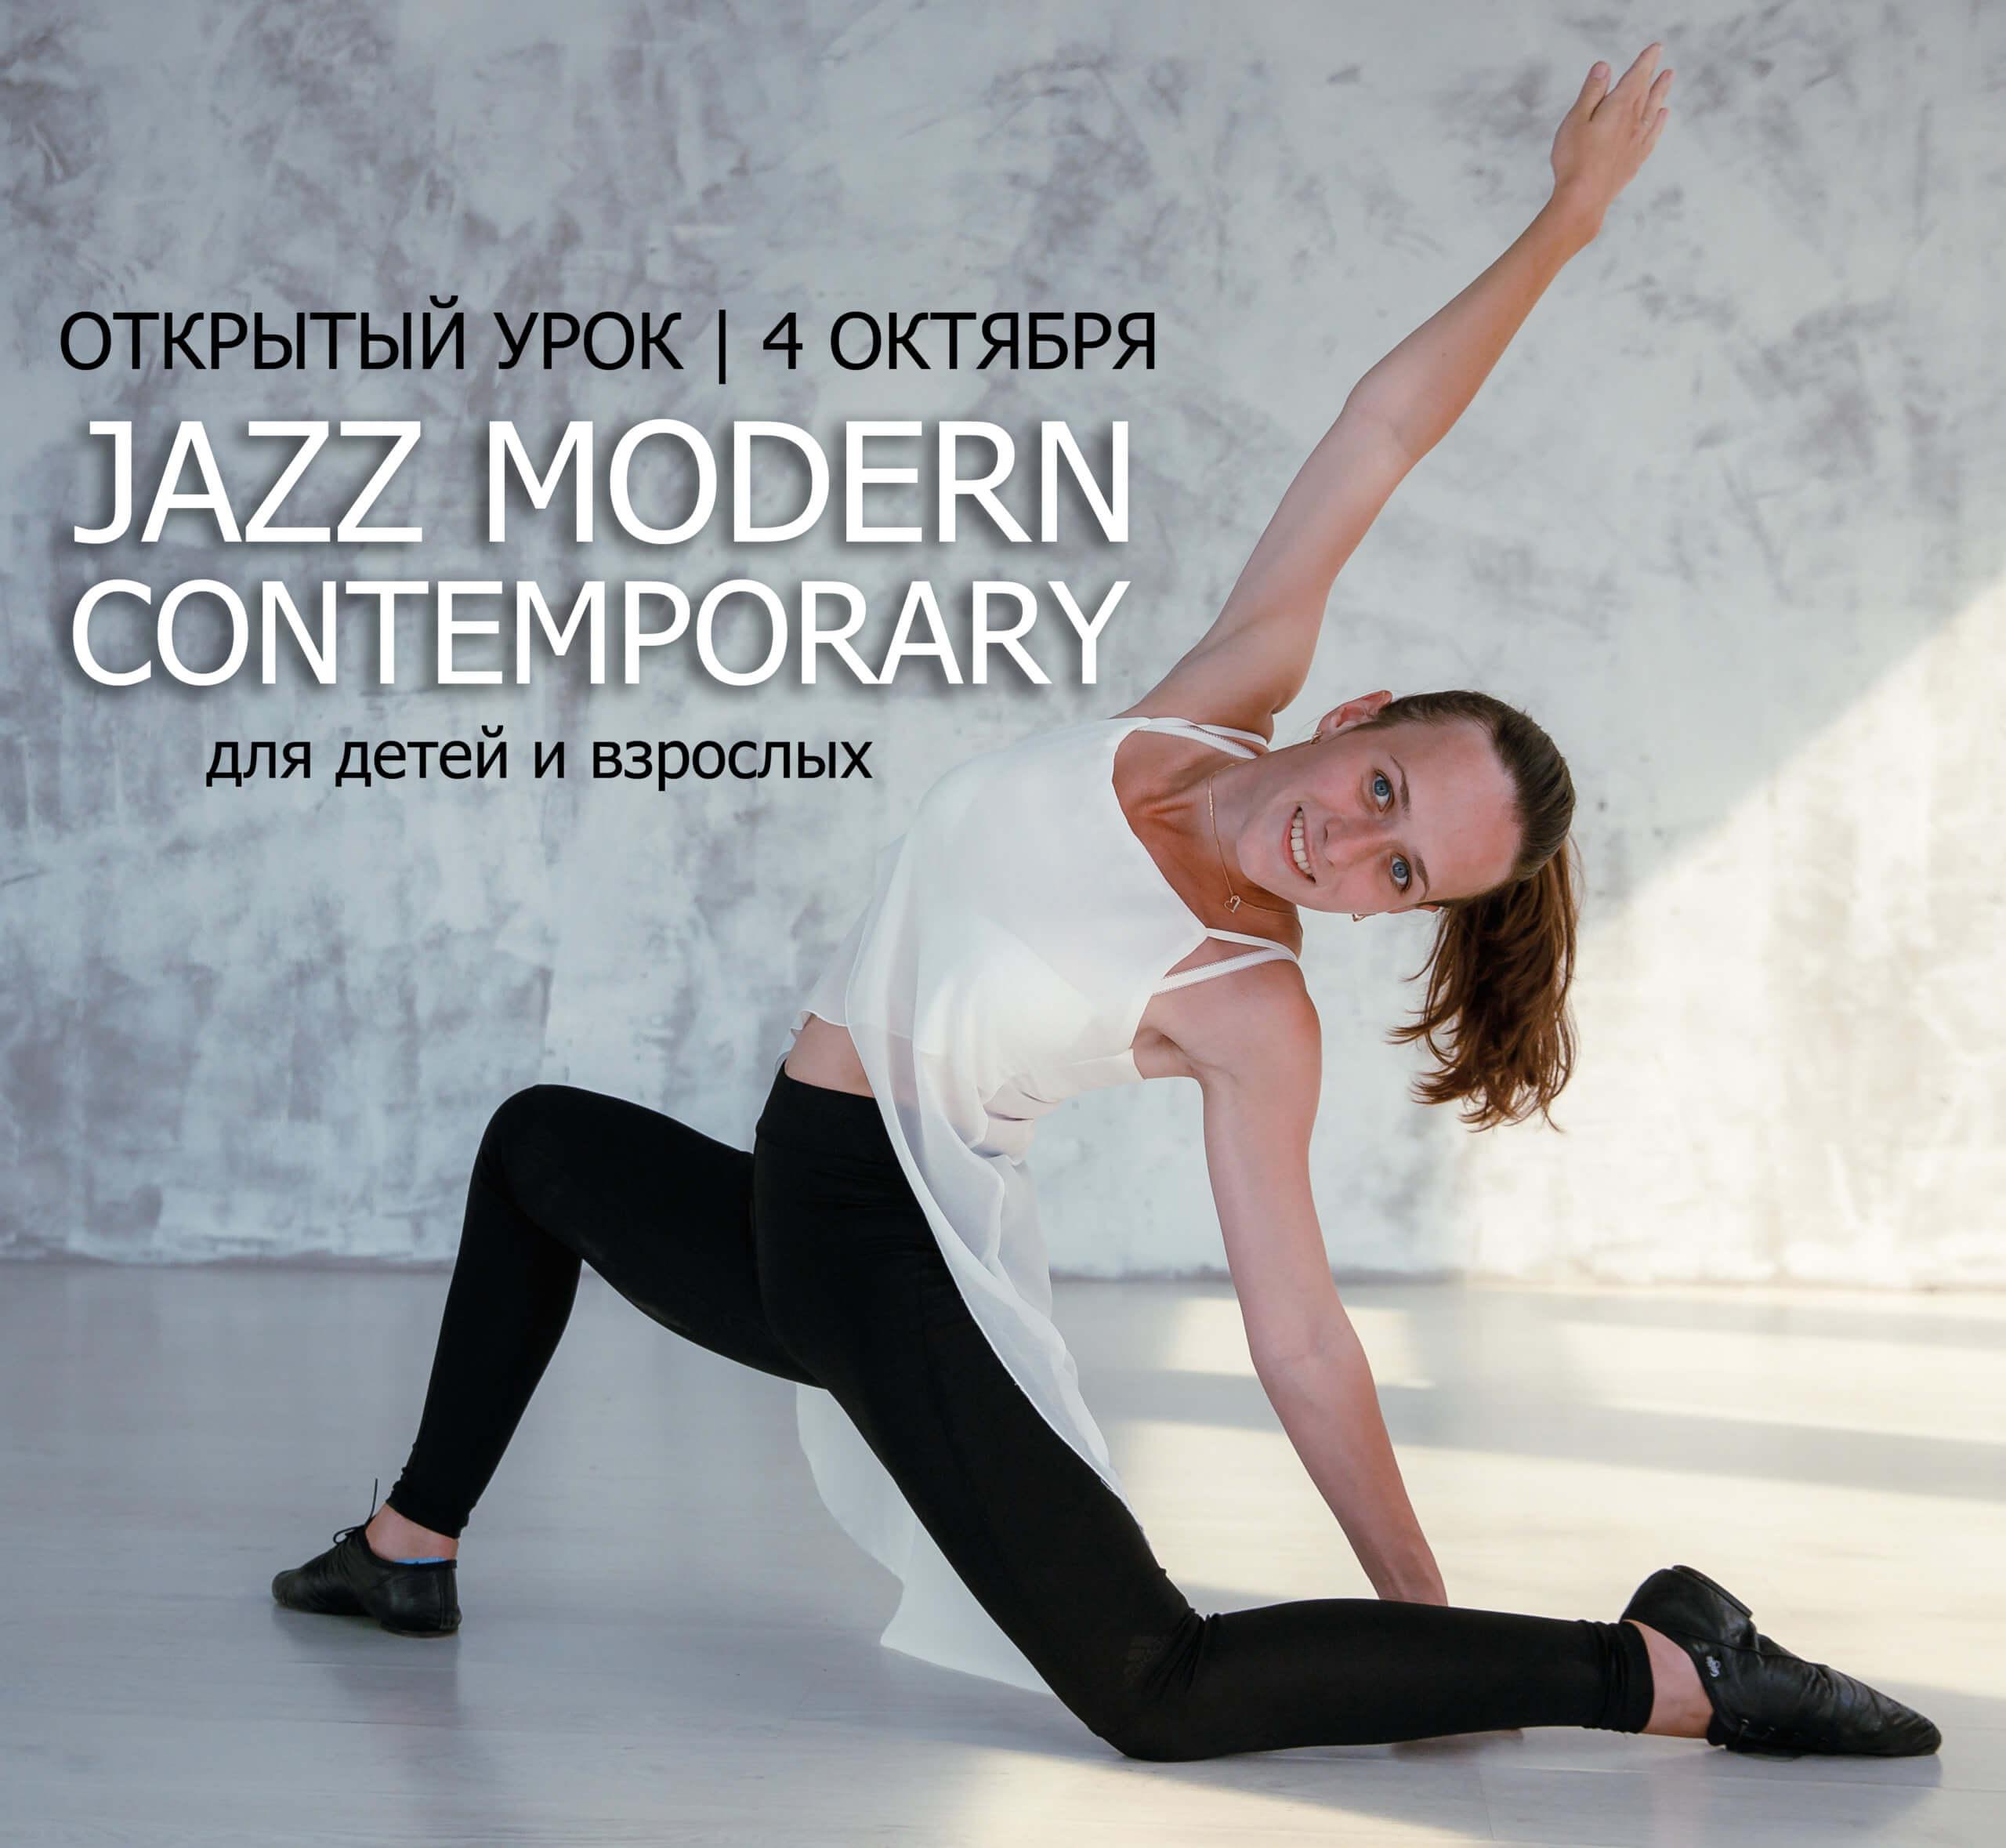 JAZZ MODERN, CONTEMPORARY | Открытые уроки 4 октября